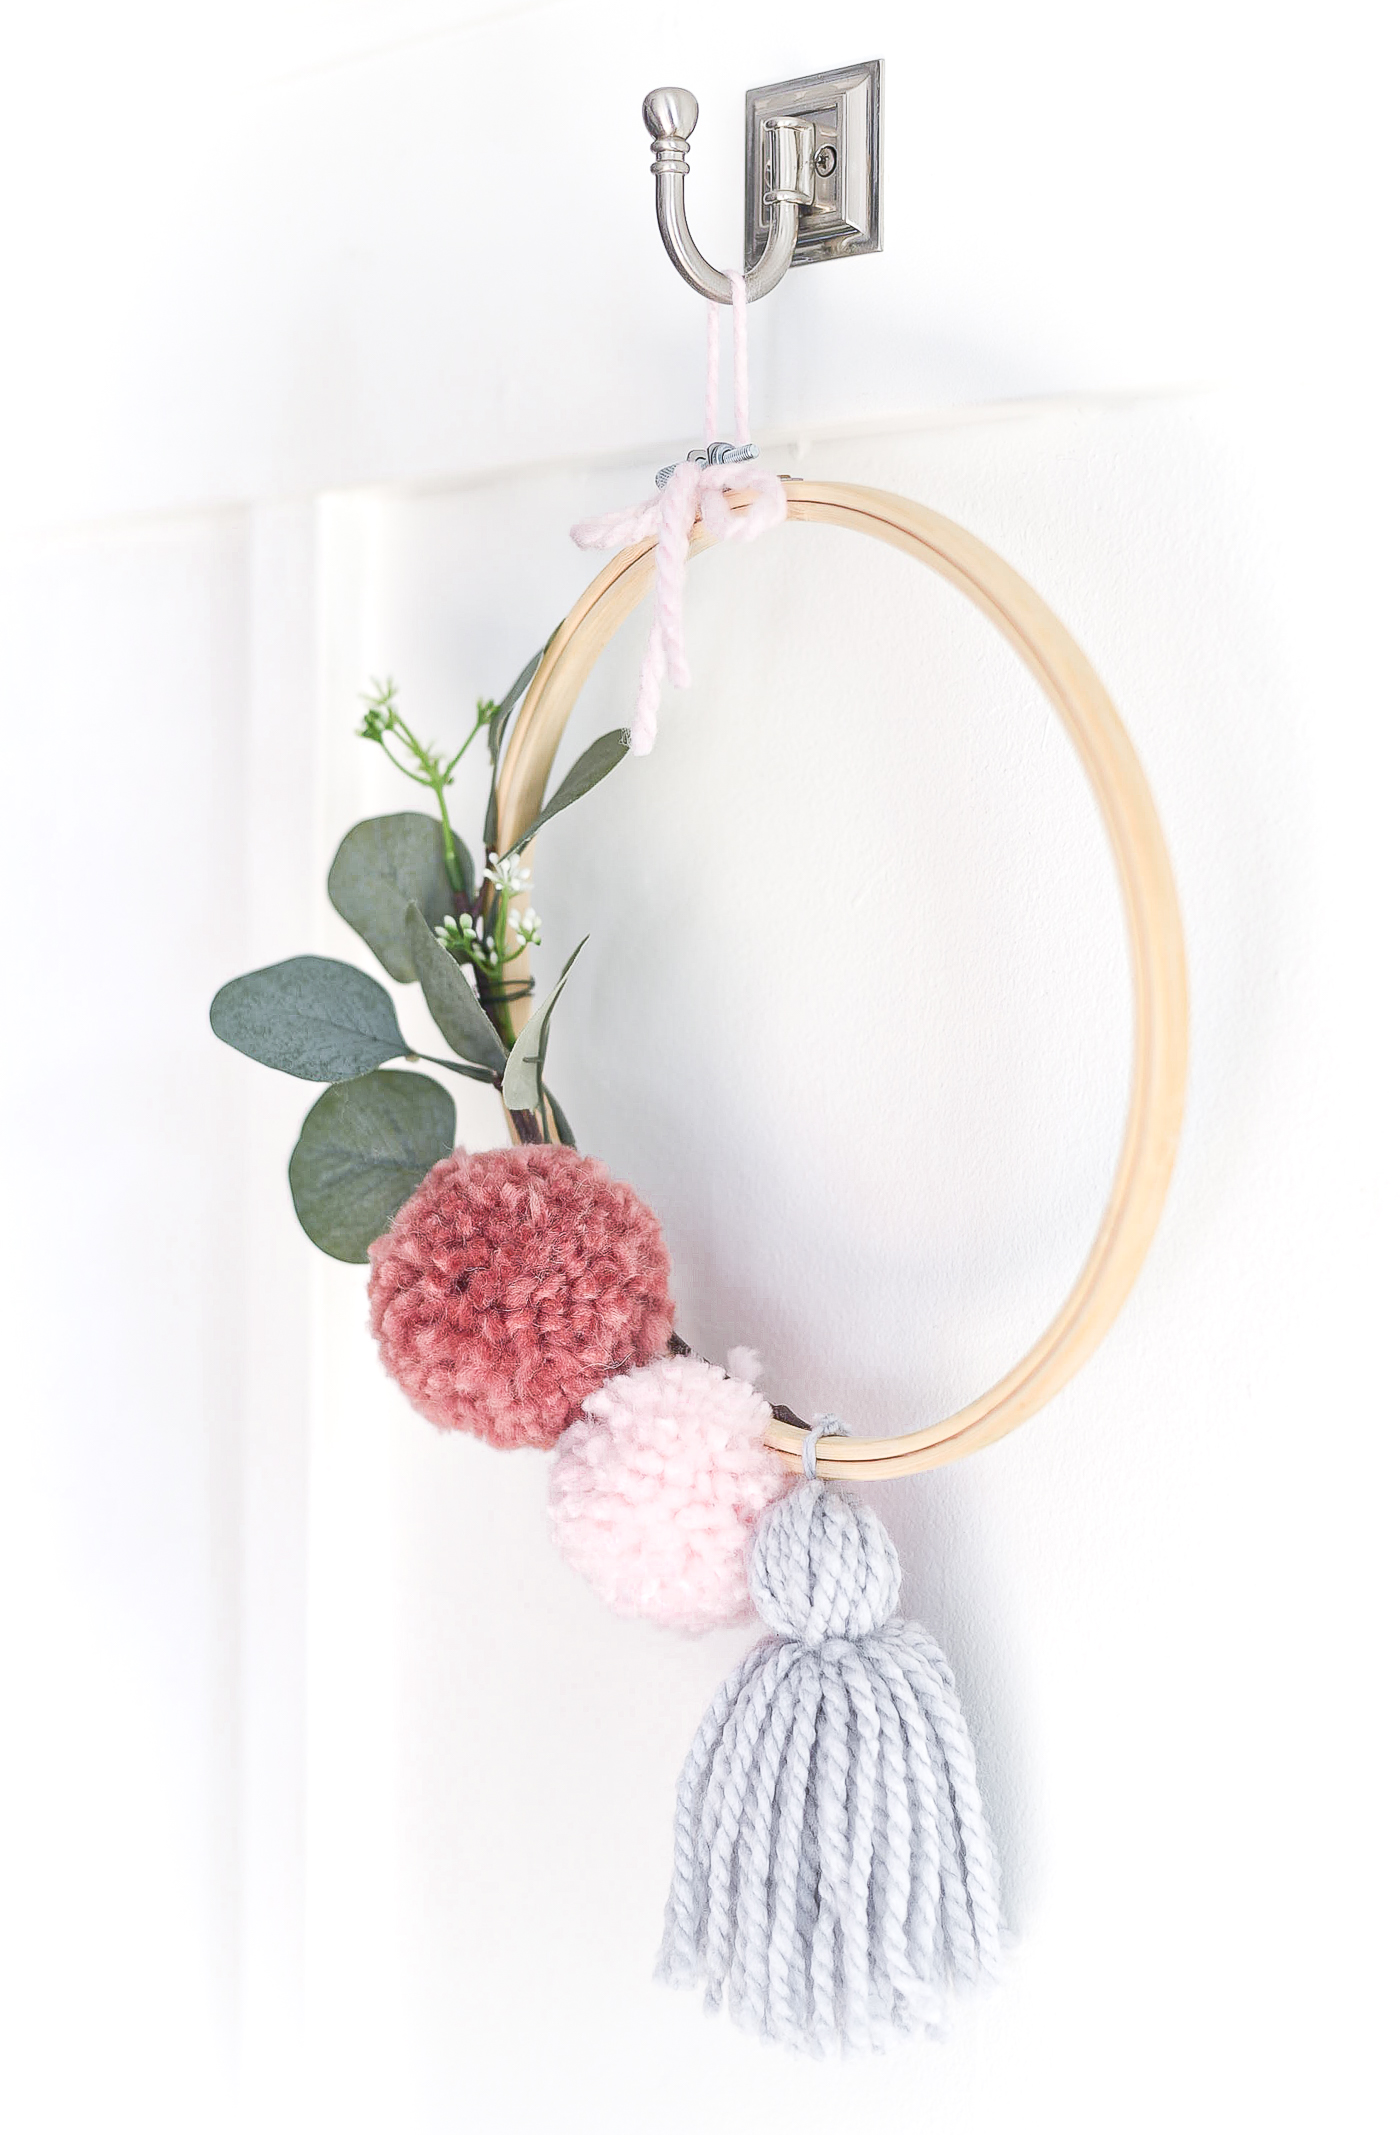 Pom Pom Embroidery Hoop Wreath for Spring - Pom Pom Wreath - Embroidery Hoop Wreath.